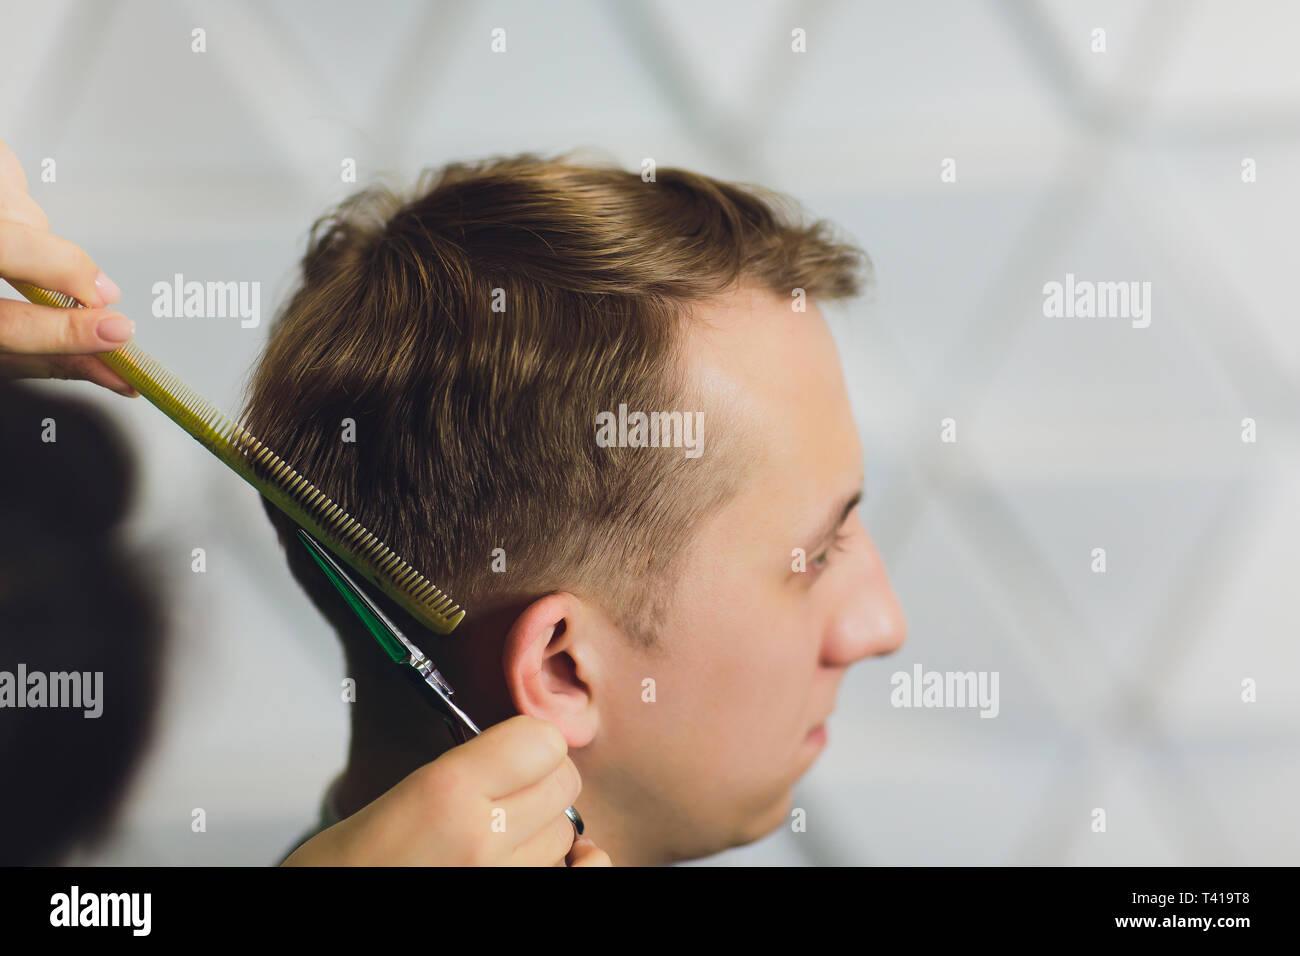 Portrait Des Jungen Mannes In Haarschnitt In Friseur Friseur Haare